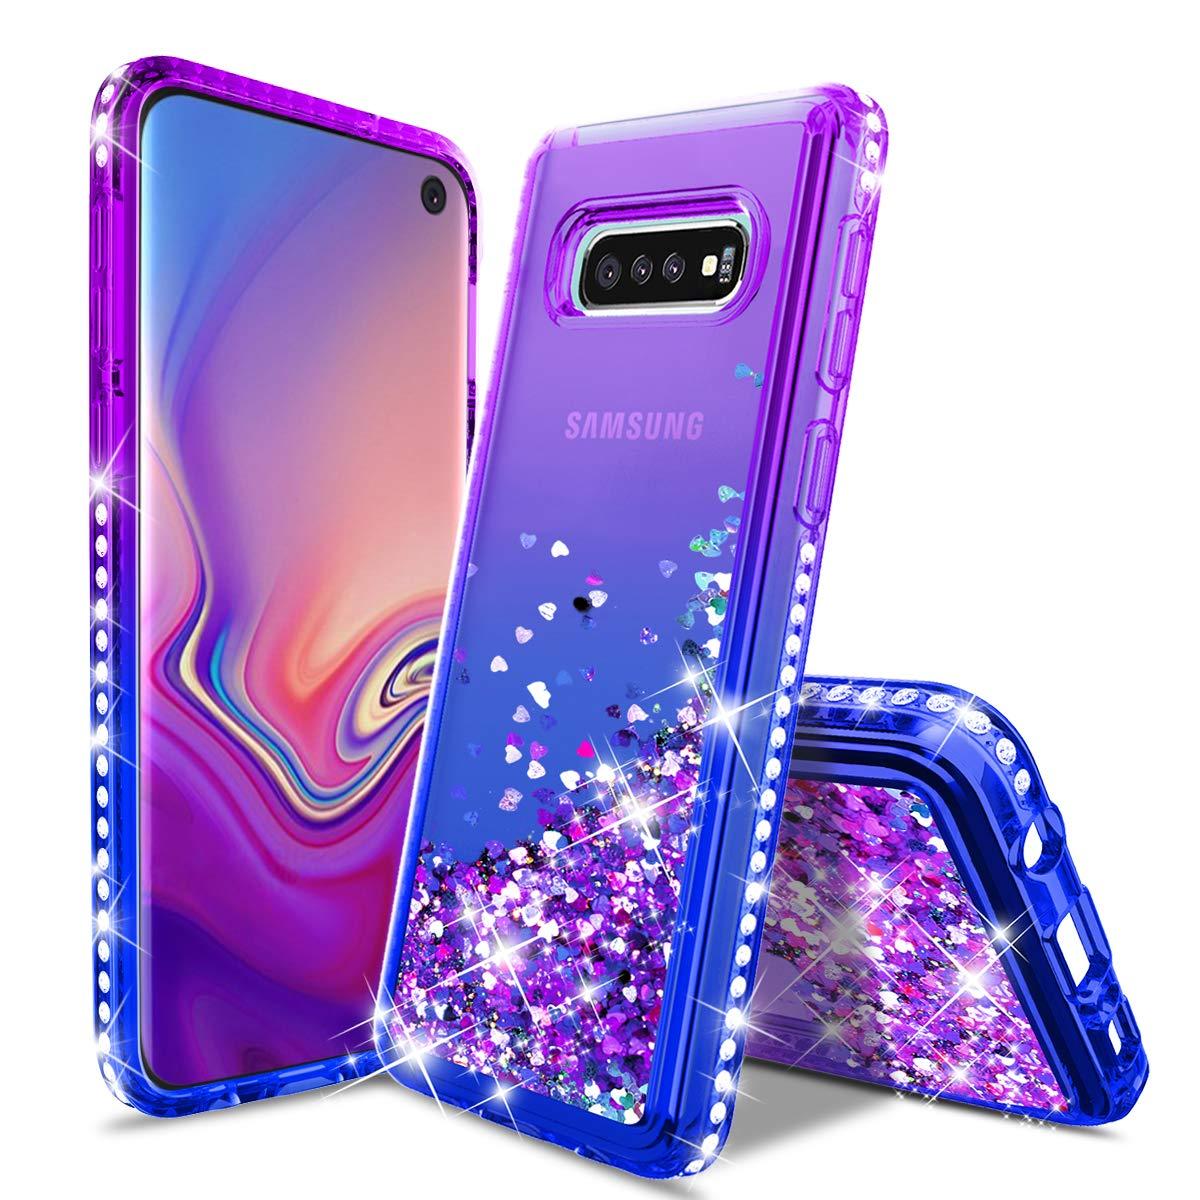 Samsung Galaxy S10E Case For Girls Women